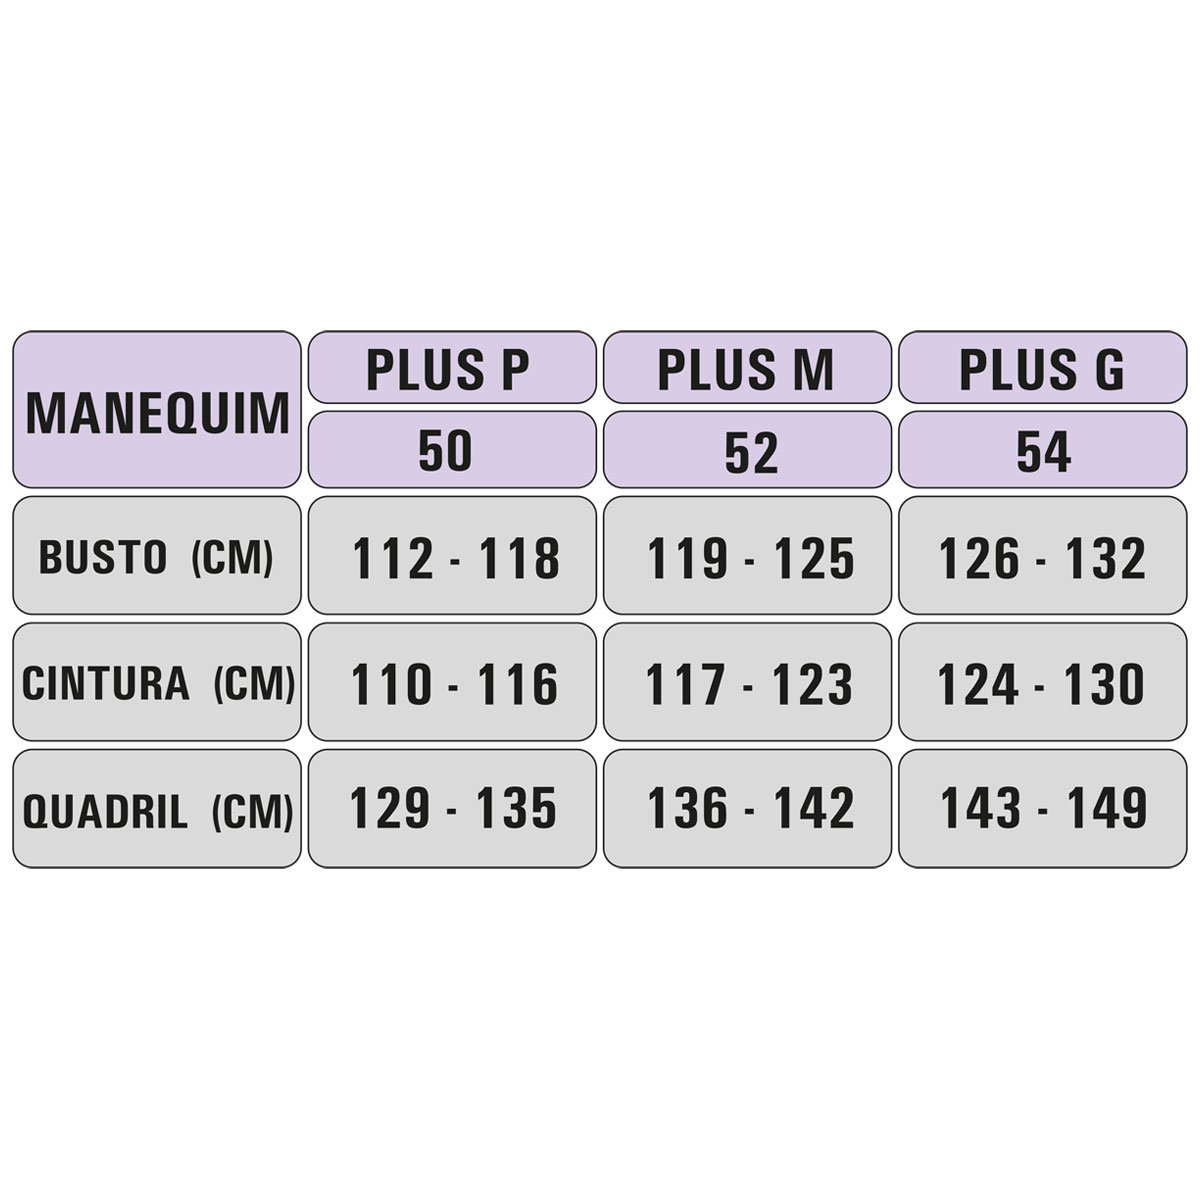 Top Fila Mesh Plus Plus Top Sustentação Preto Média Size BSqBr